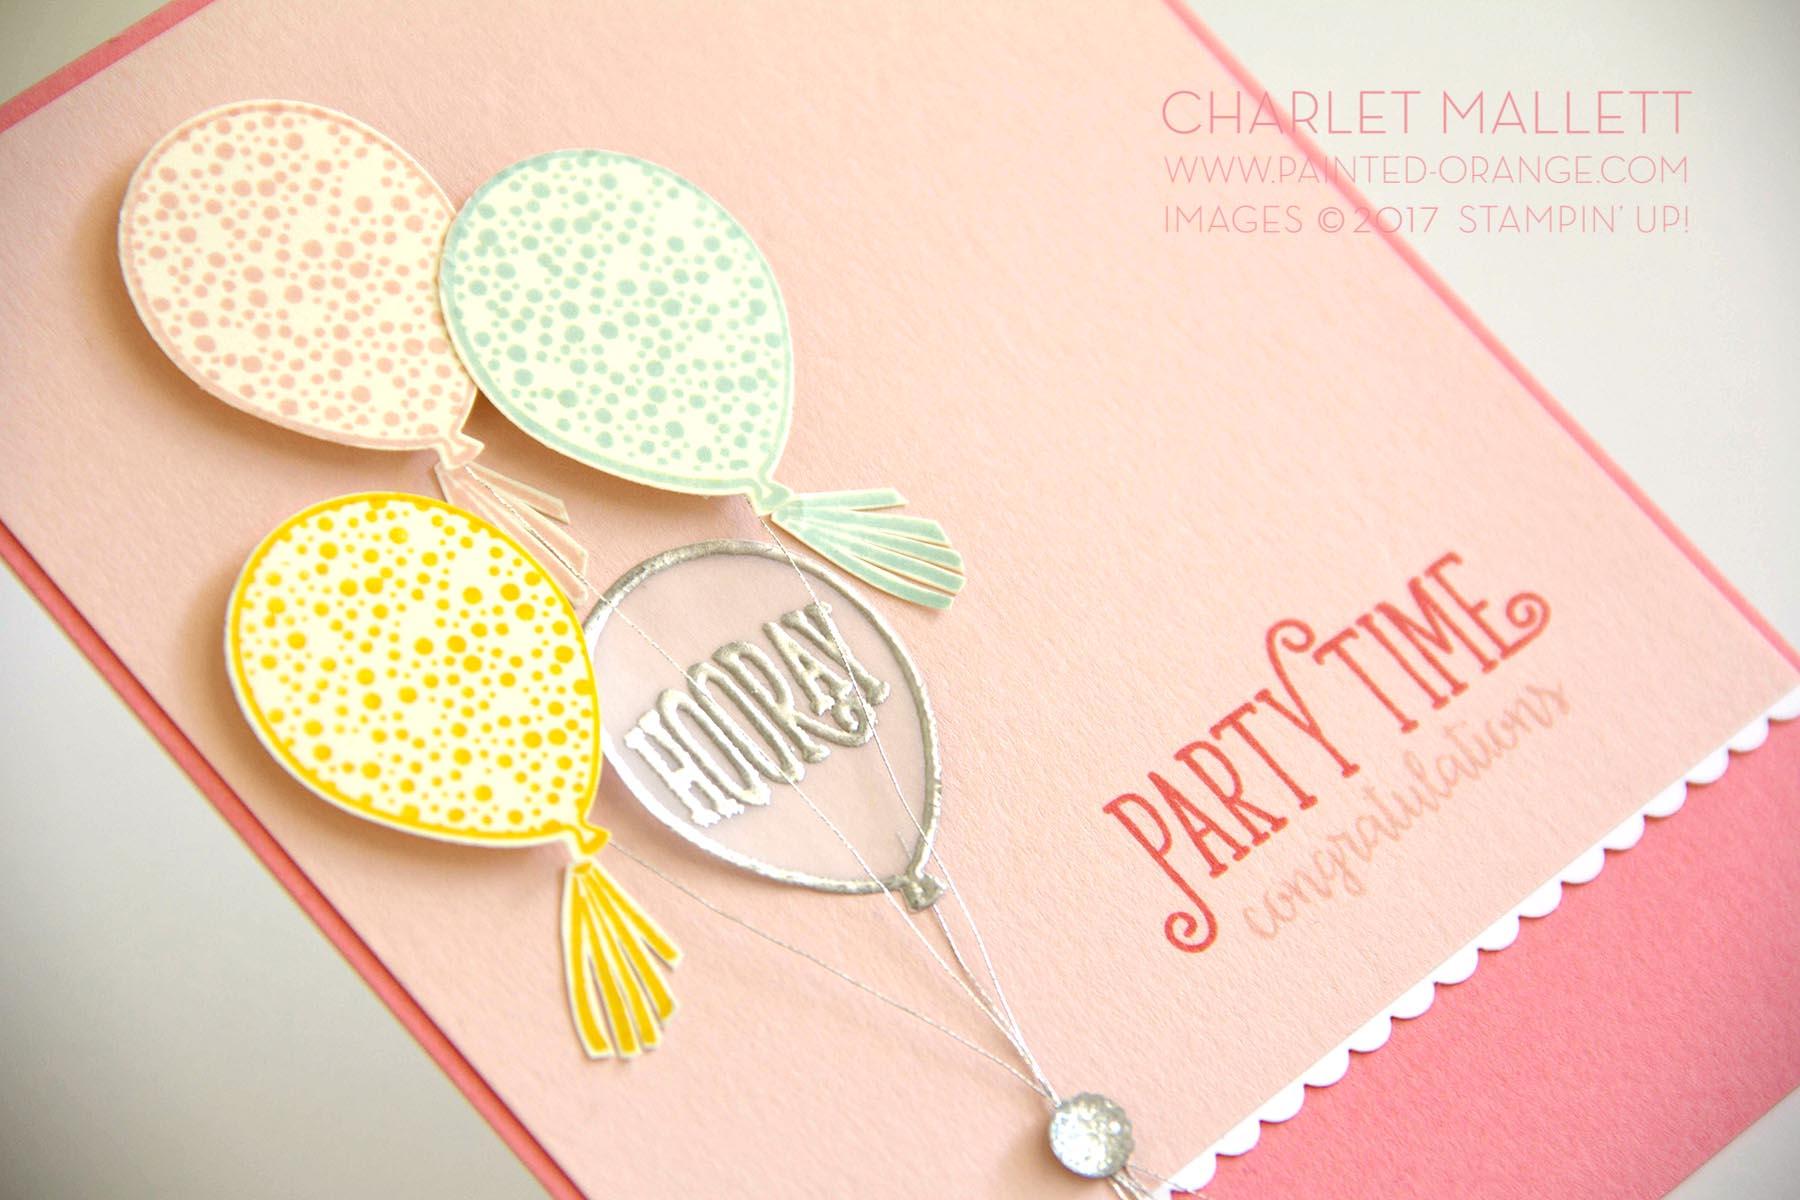 Happy Birthday Gorgeous - Charlet Mallett, Stampin' Up!